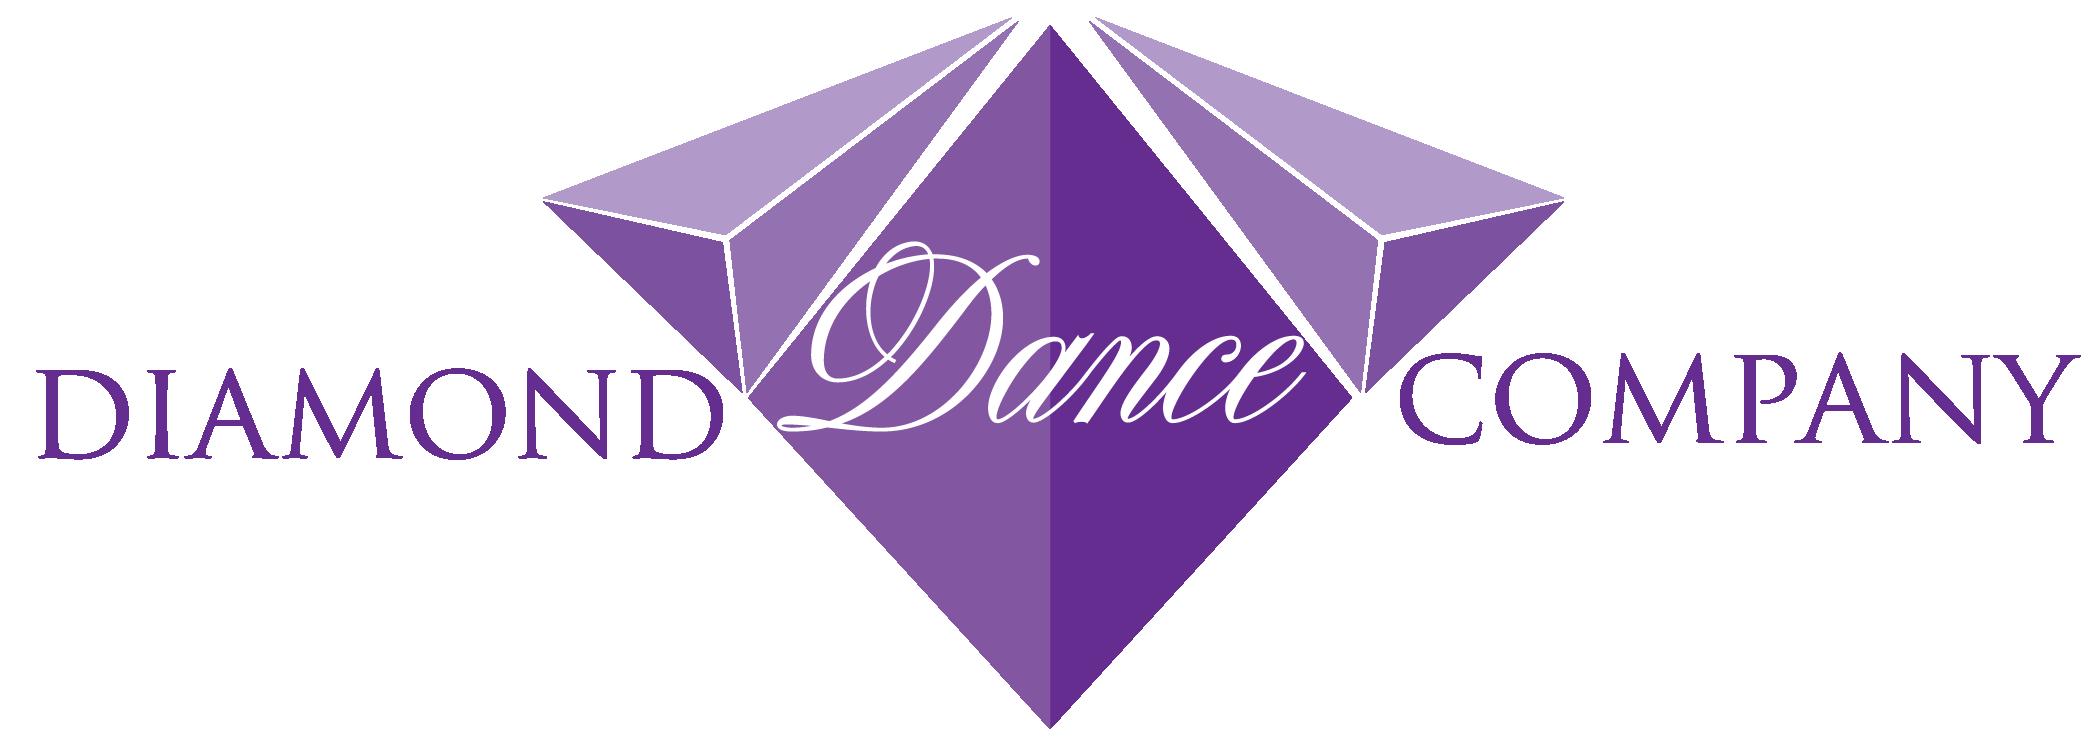 ddc-main-logo.png